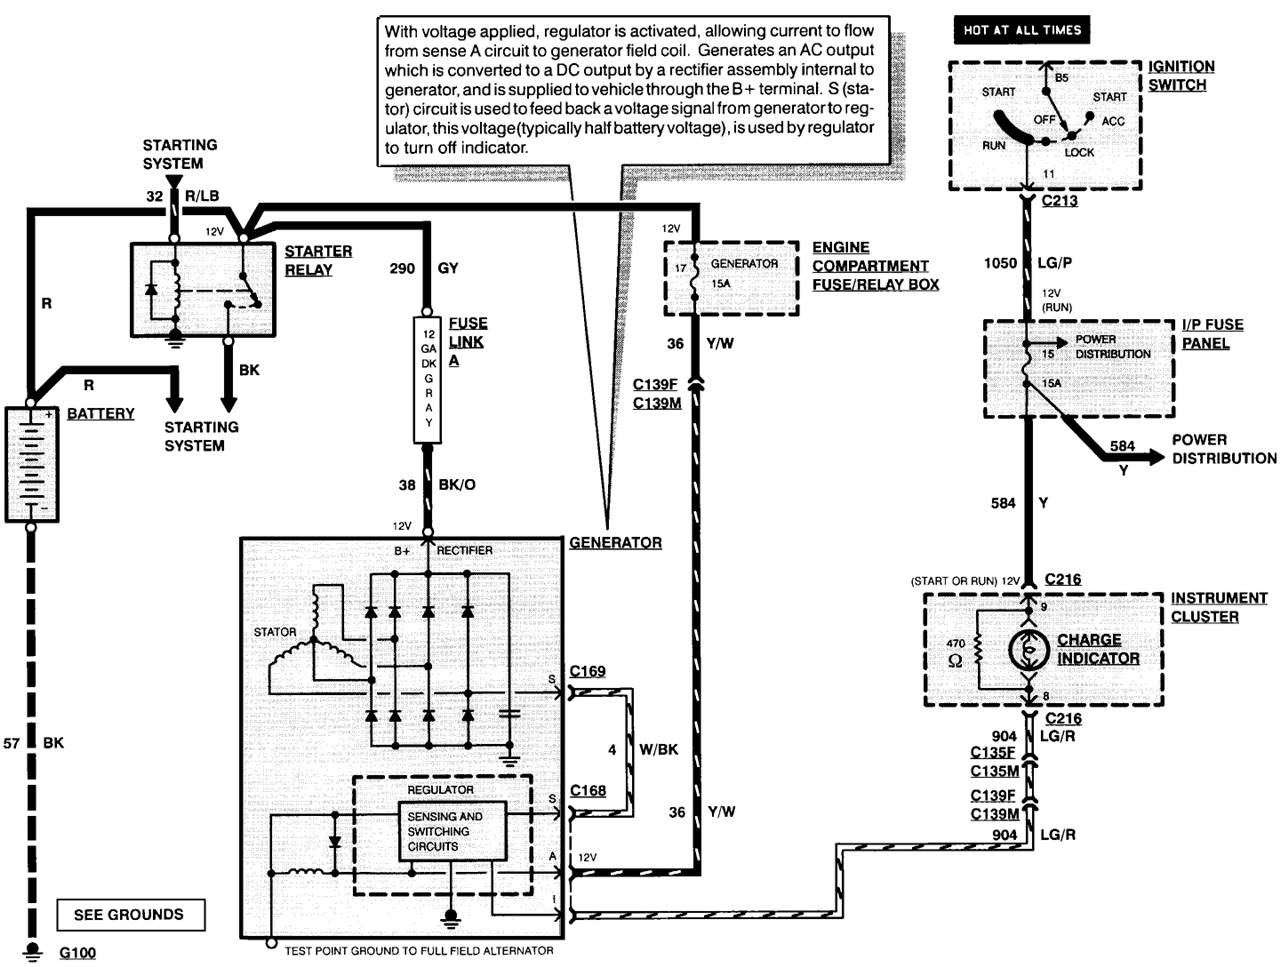 1995 Ford Alternator Wiring Diagram - Wiring Diagrams Data global -  global.ilsoleovunque.it